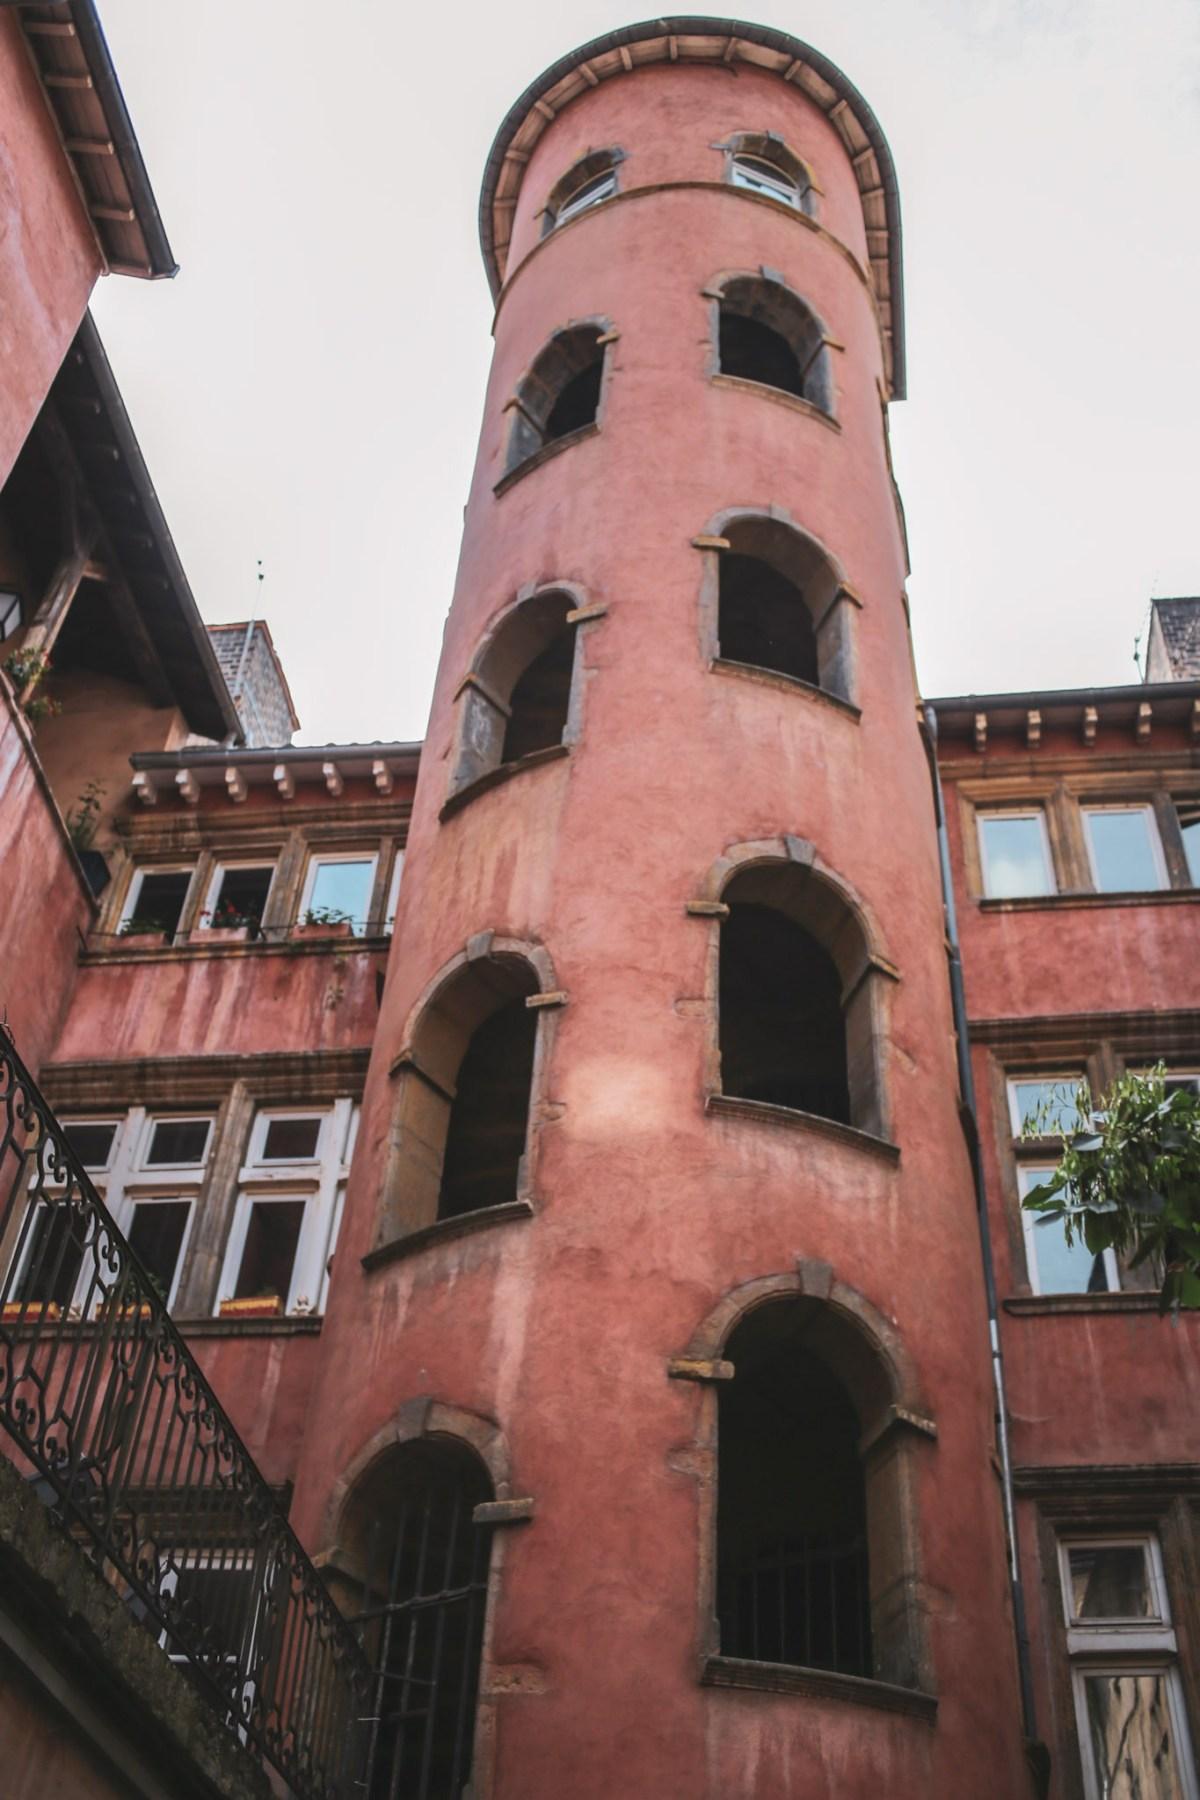 Traboule: The Secret Passageways of Silk Traders of Lyon